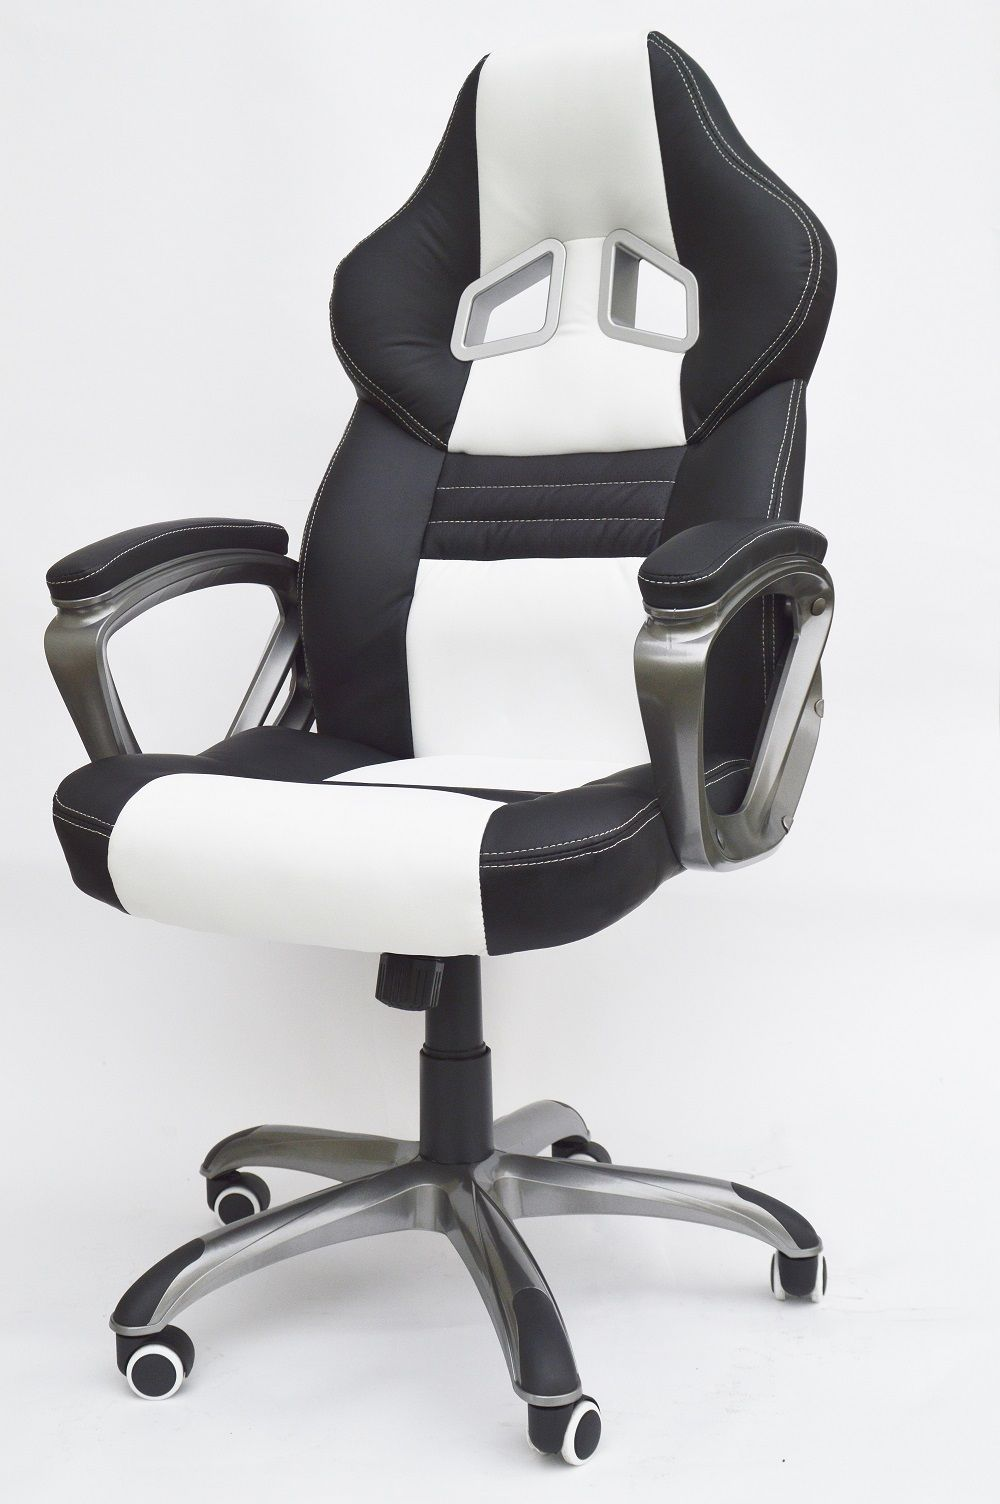 drehstuhl sportsitz chefsessel b rostuhl stuhl racing schalensitz b ro racer. Black Bedroom Furniture Sets. Home Design Ideas